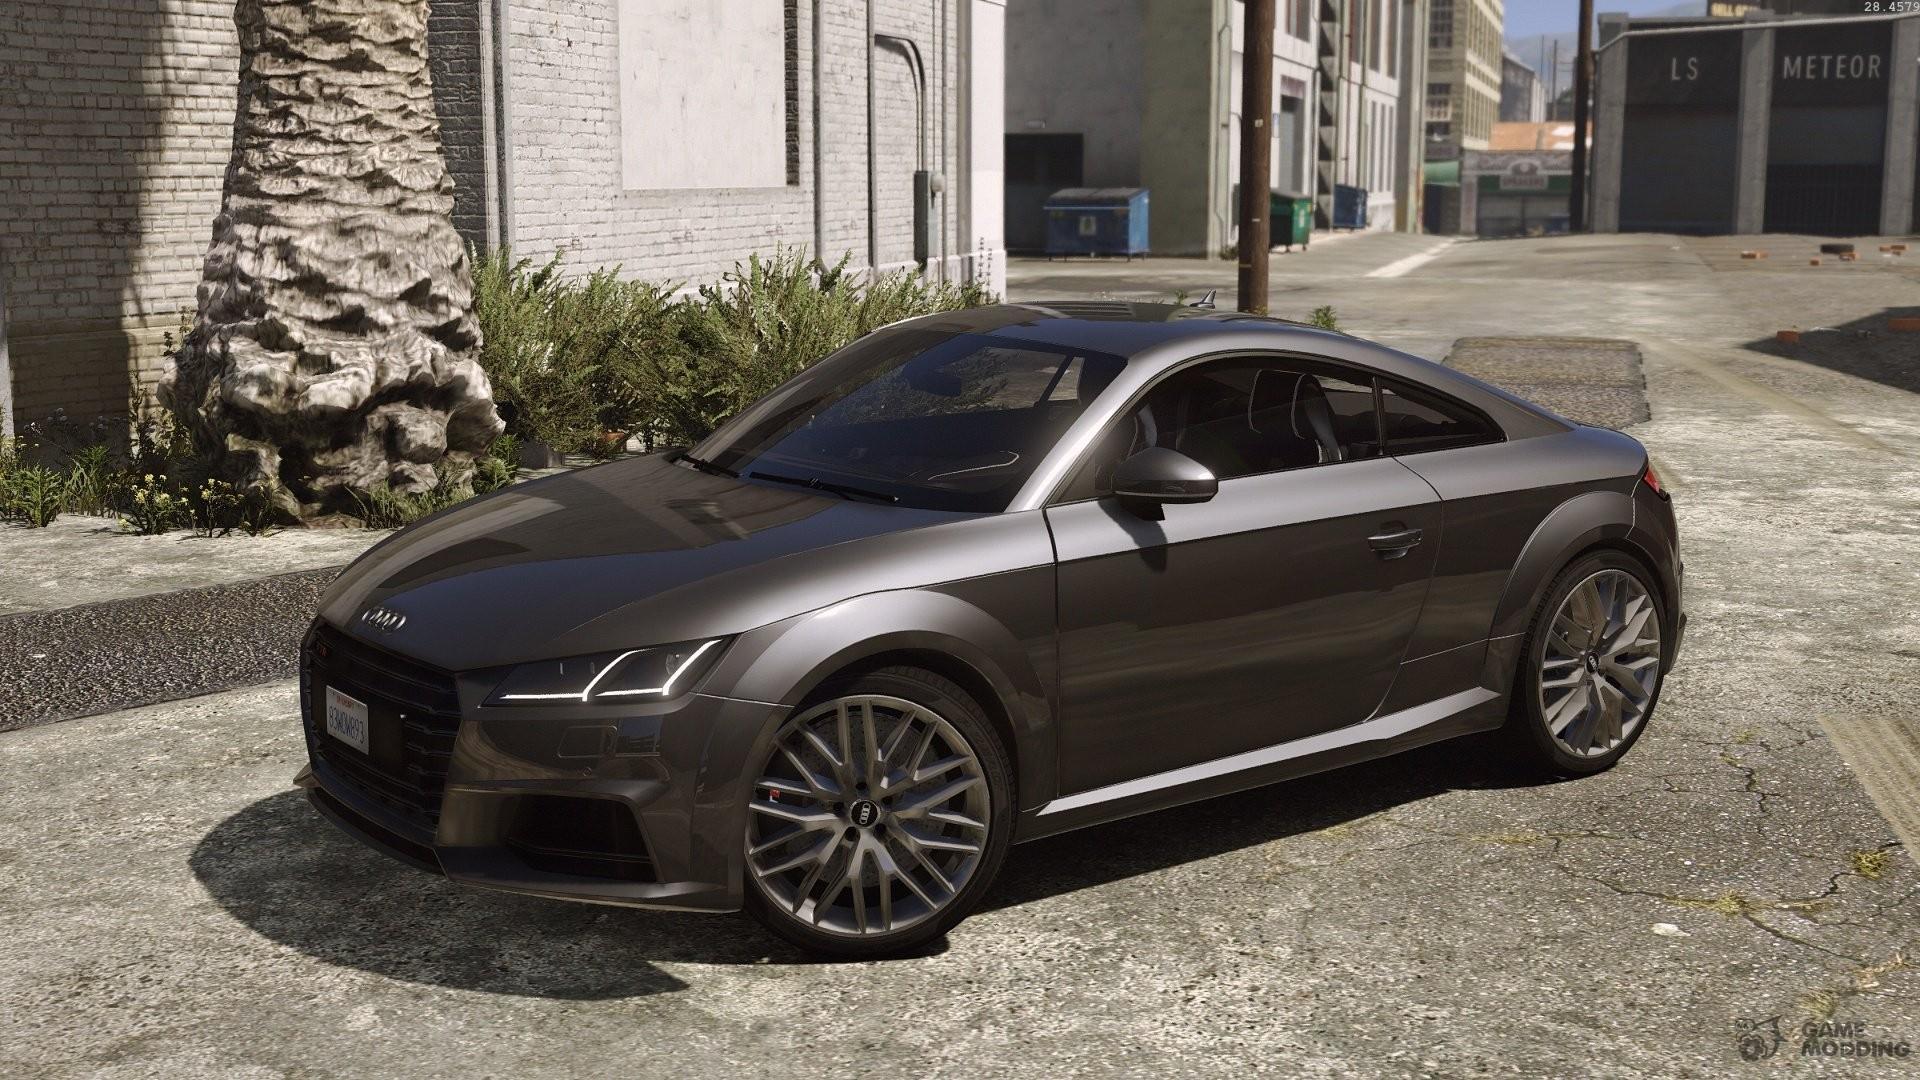 Audi R8 Interior Automatic Audi TTS 2015 v0.1 for...